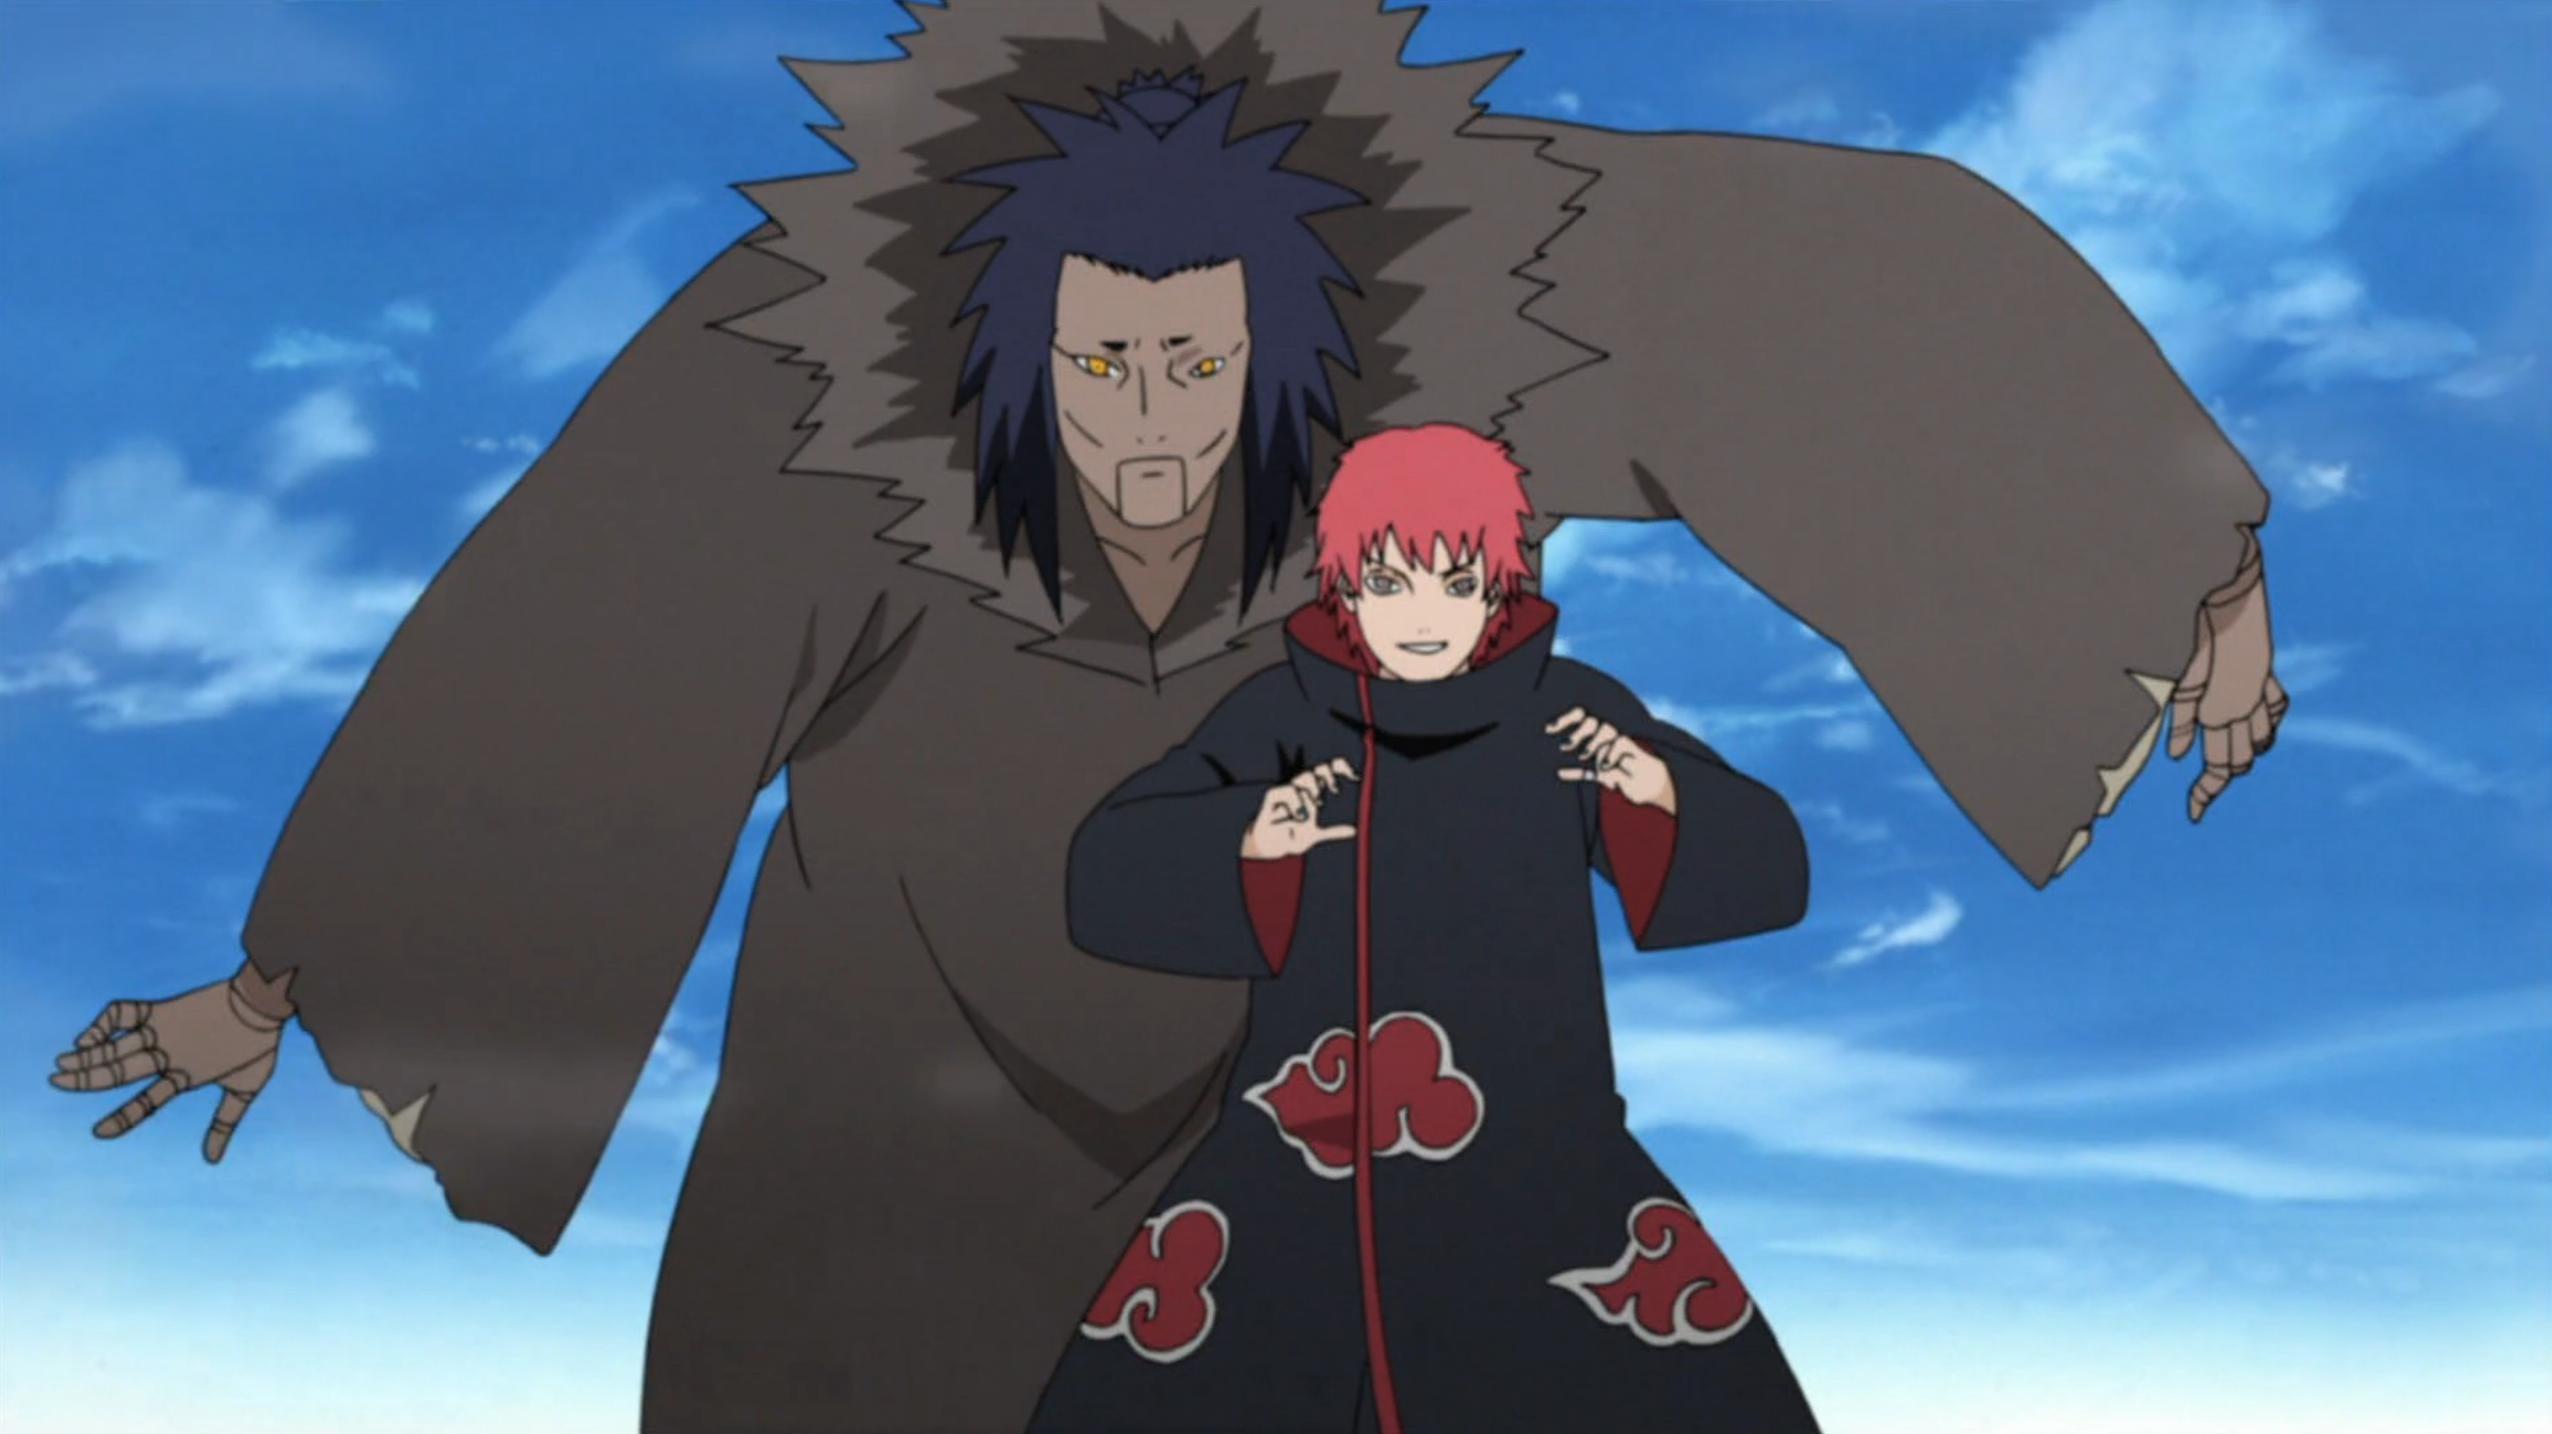 Third Kazekage (puppet) | Narutopedia | Fandom